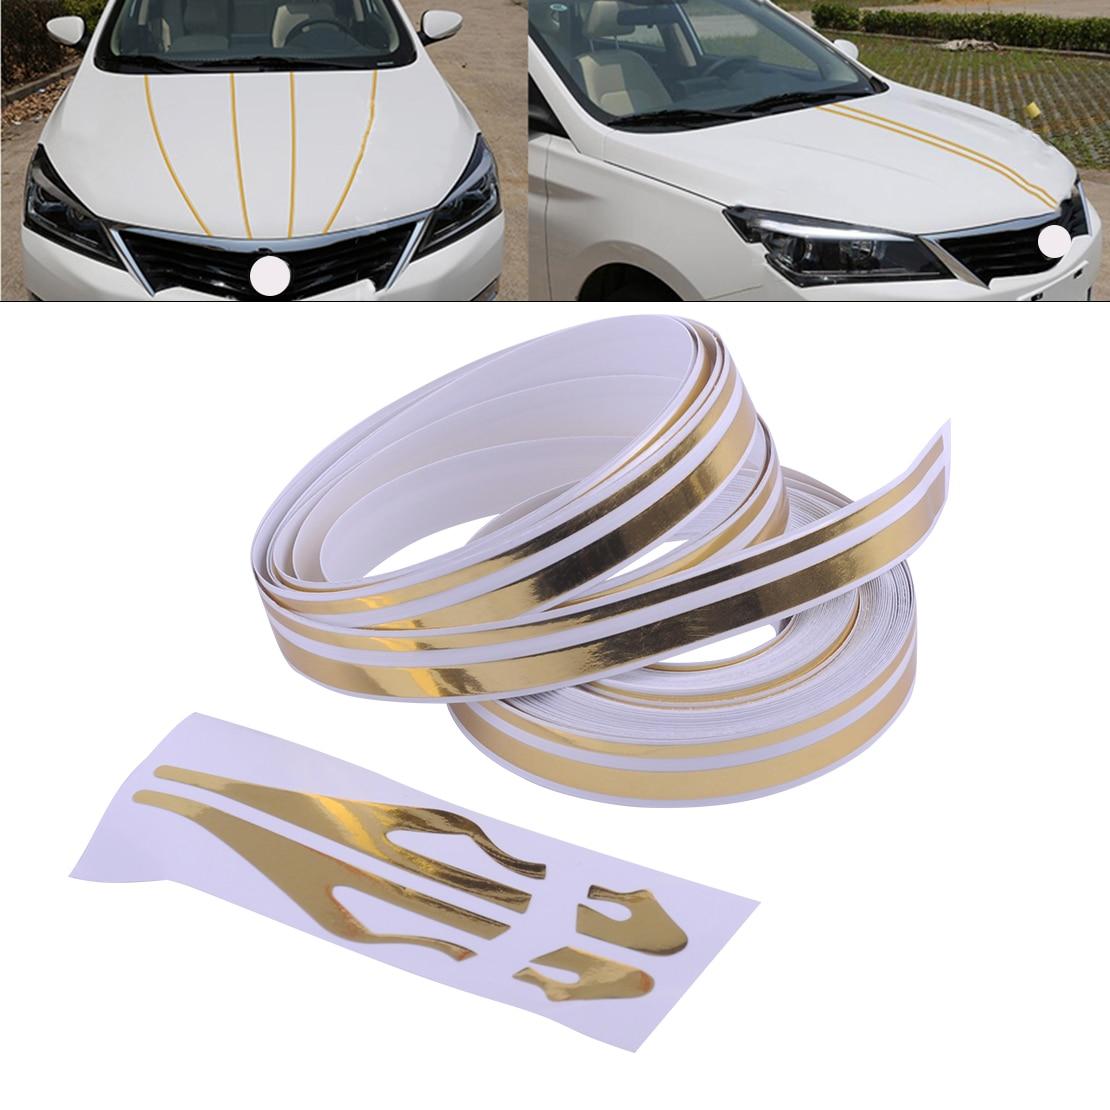 DWCX Car Styling 12mm Striping Sticker Double Line Pin Stripe Streamline Tape Vinyl Roll Decal Fit For VW Audi BMW Mazda Hyundai